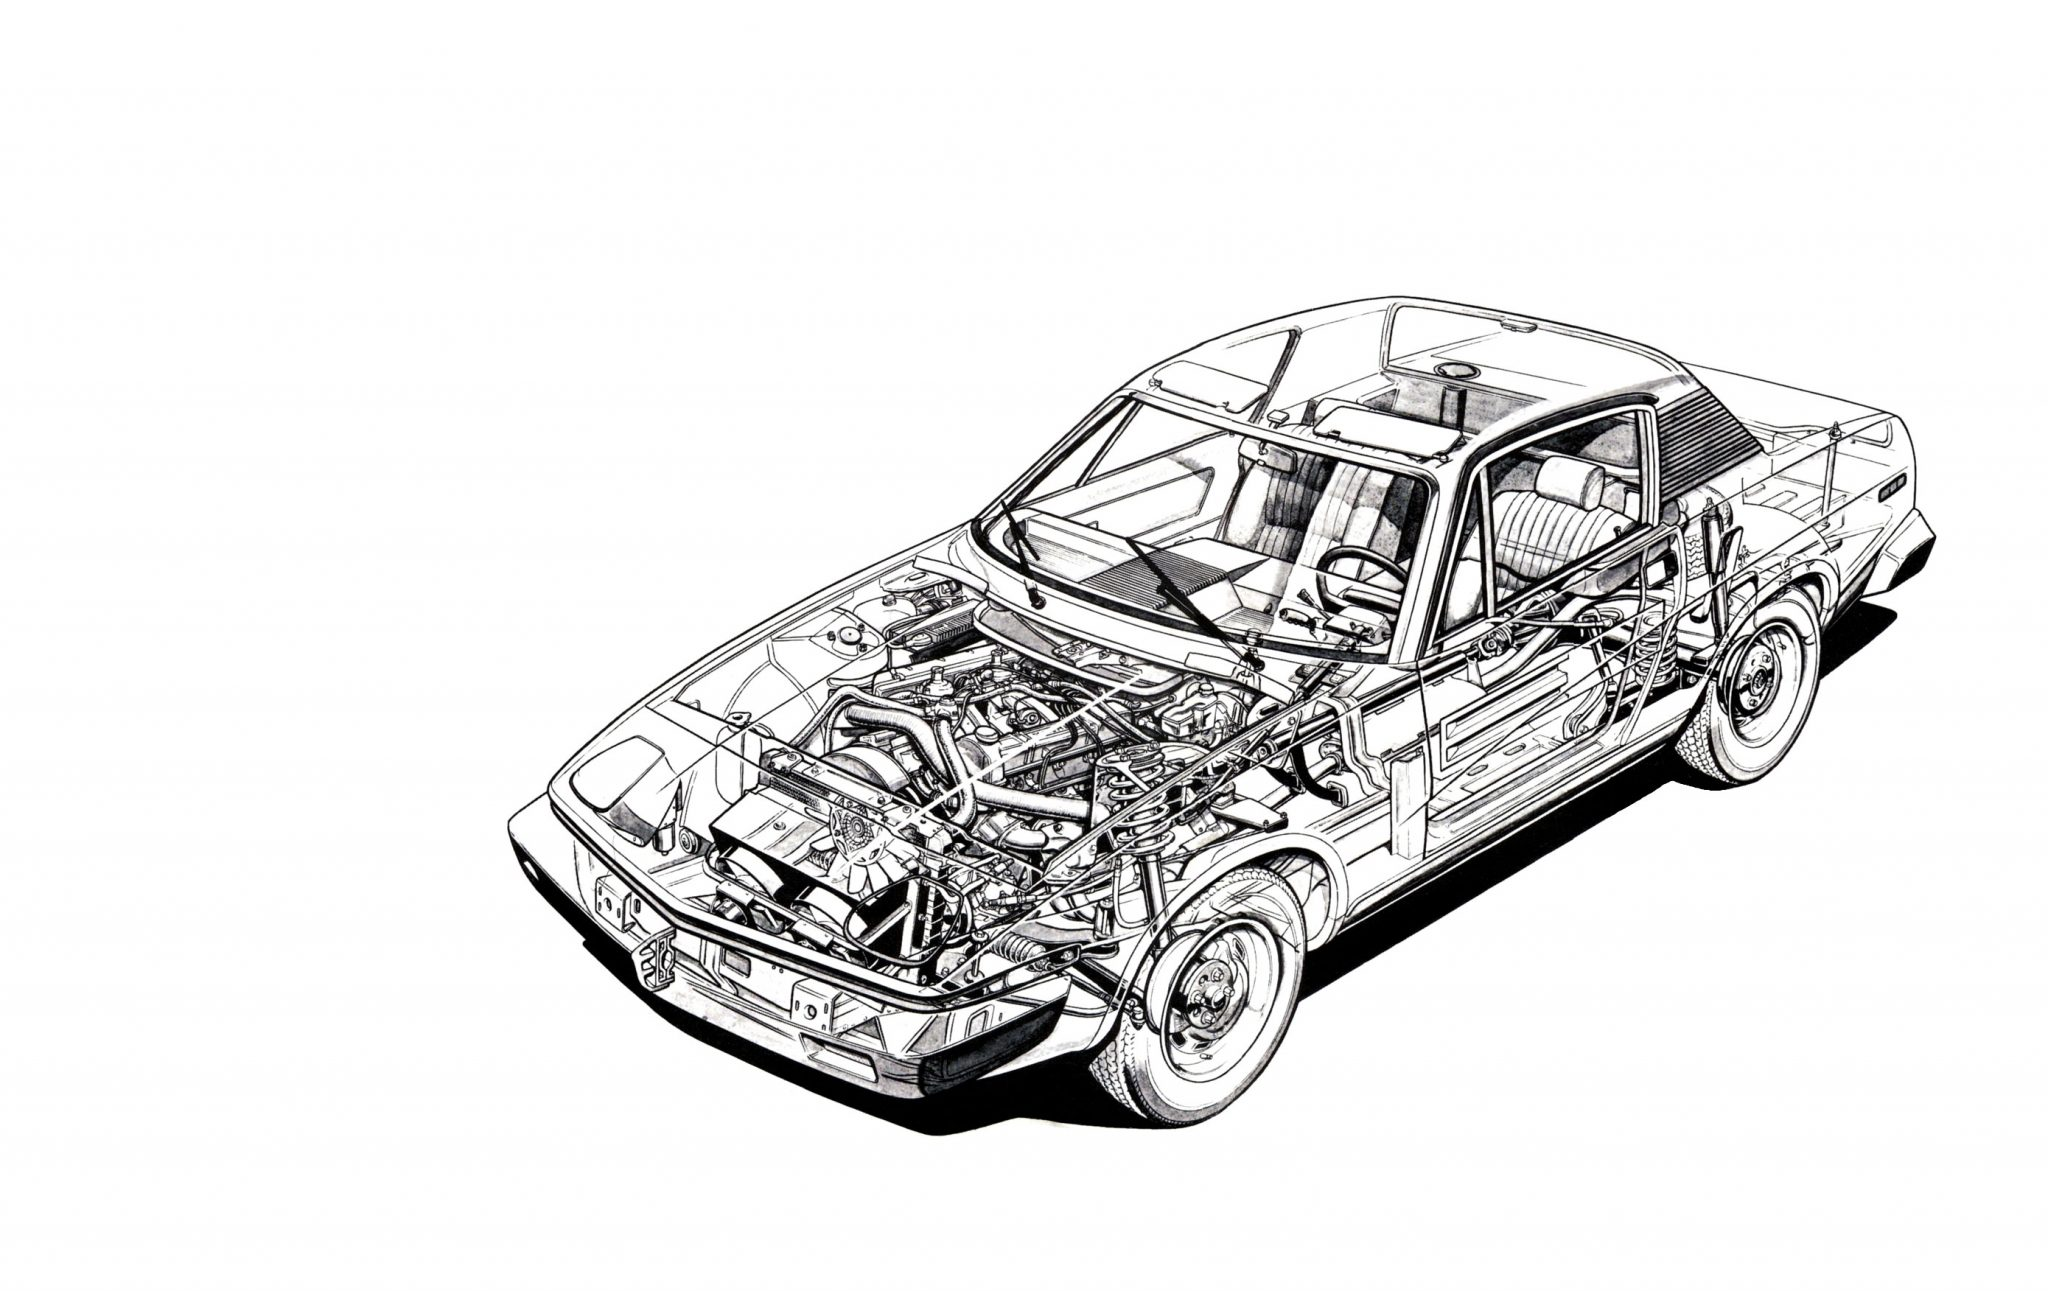 Triumph Tr7 Cutaway Wallpaper